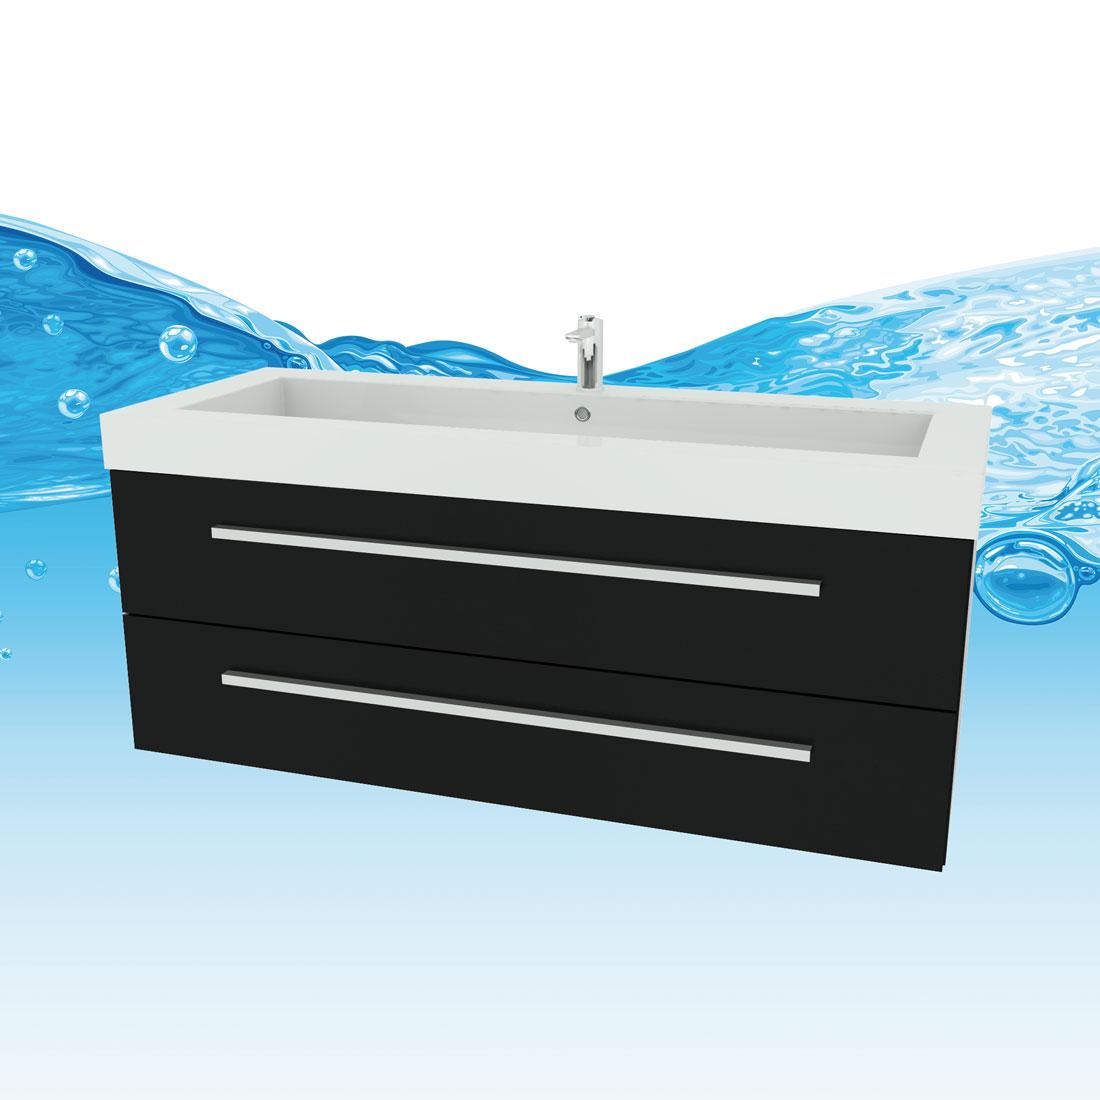 badm bel set city 101 v5 esche schwarz badezimmerm bel waschtisch 120cm. Black Bedroom Furniture Sets. Home Design Ideas